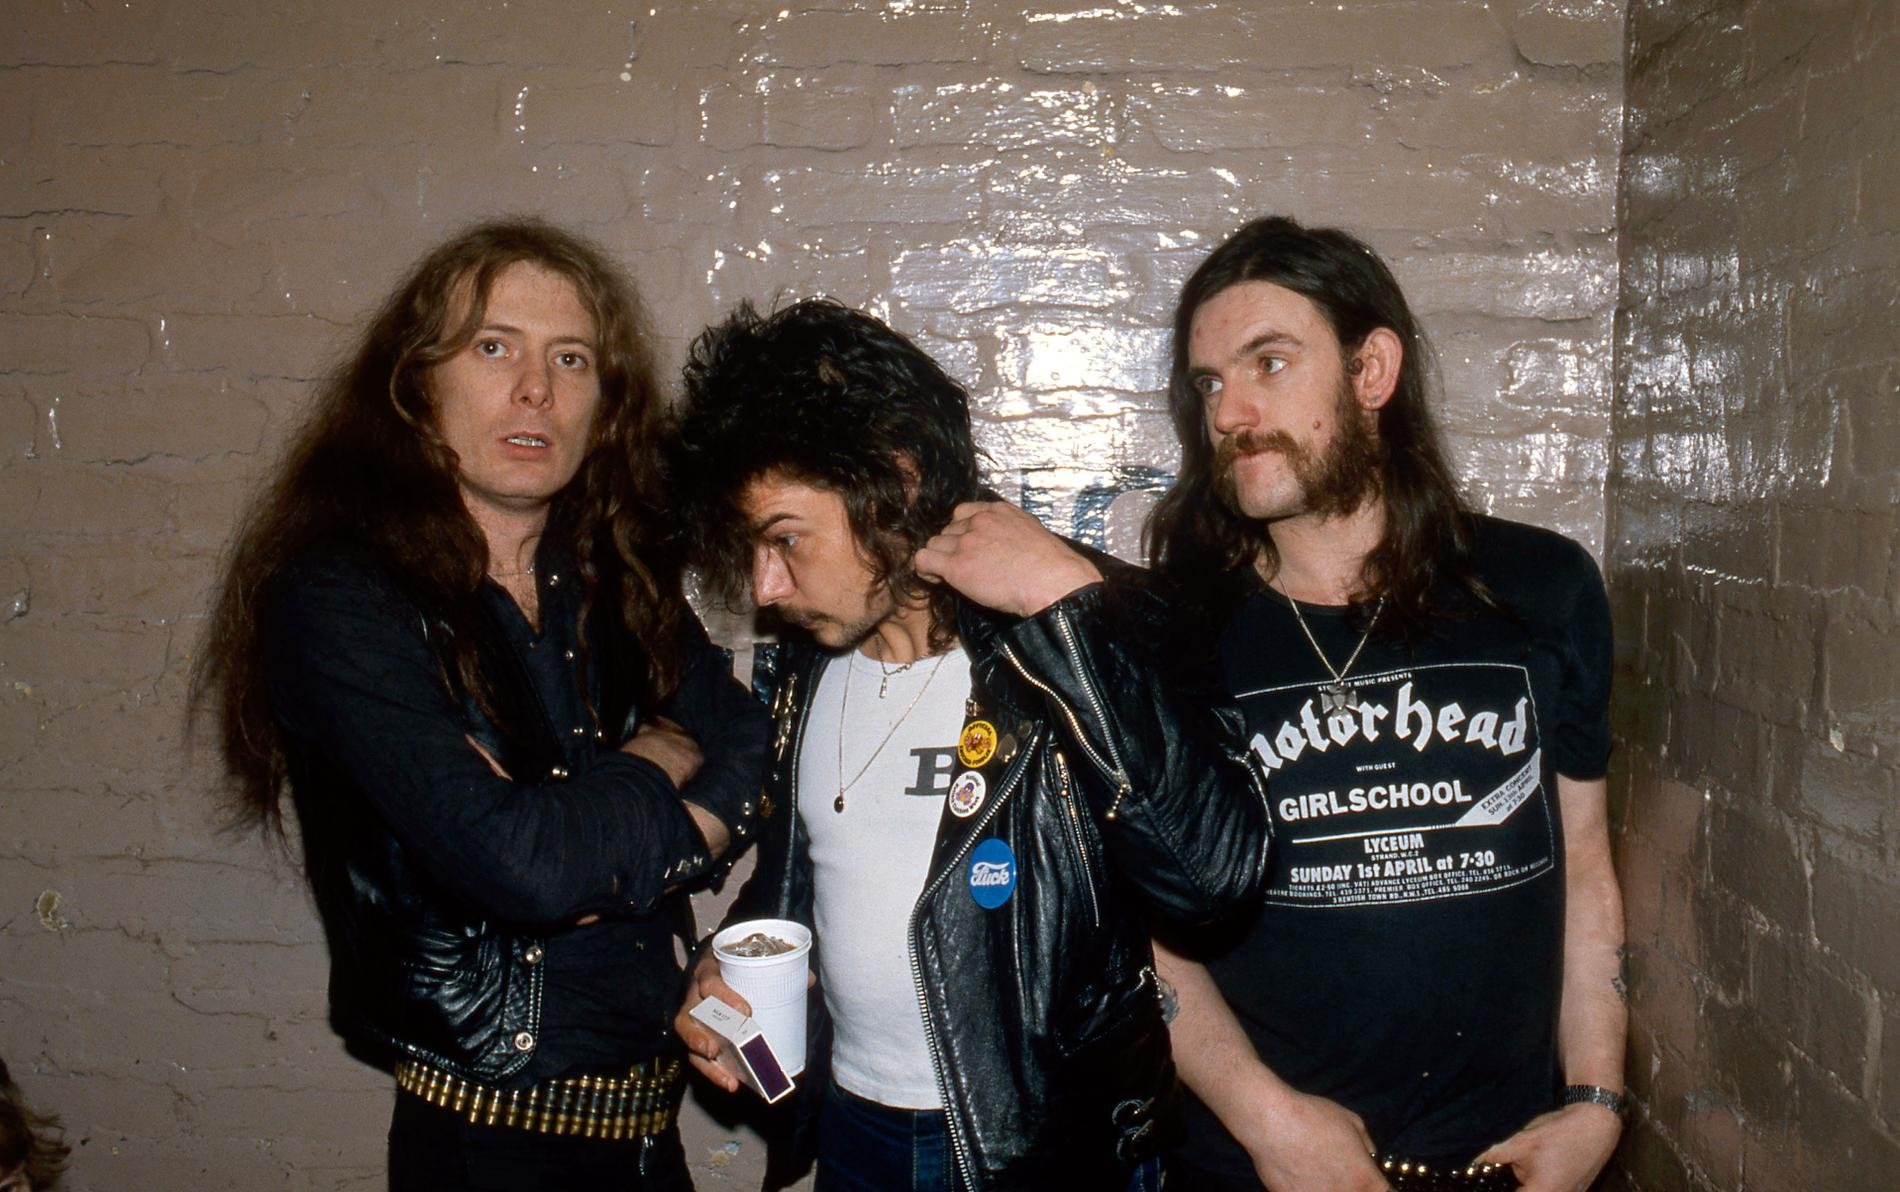 Eddie Clarke, Phil Taylor, Lemmy Kilmister - Motörhead 1980